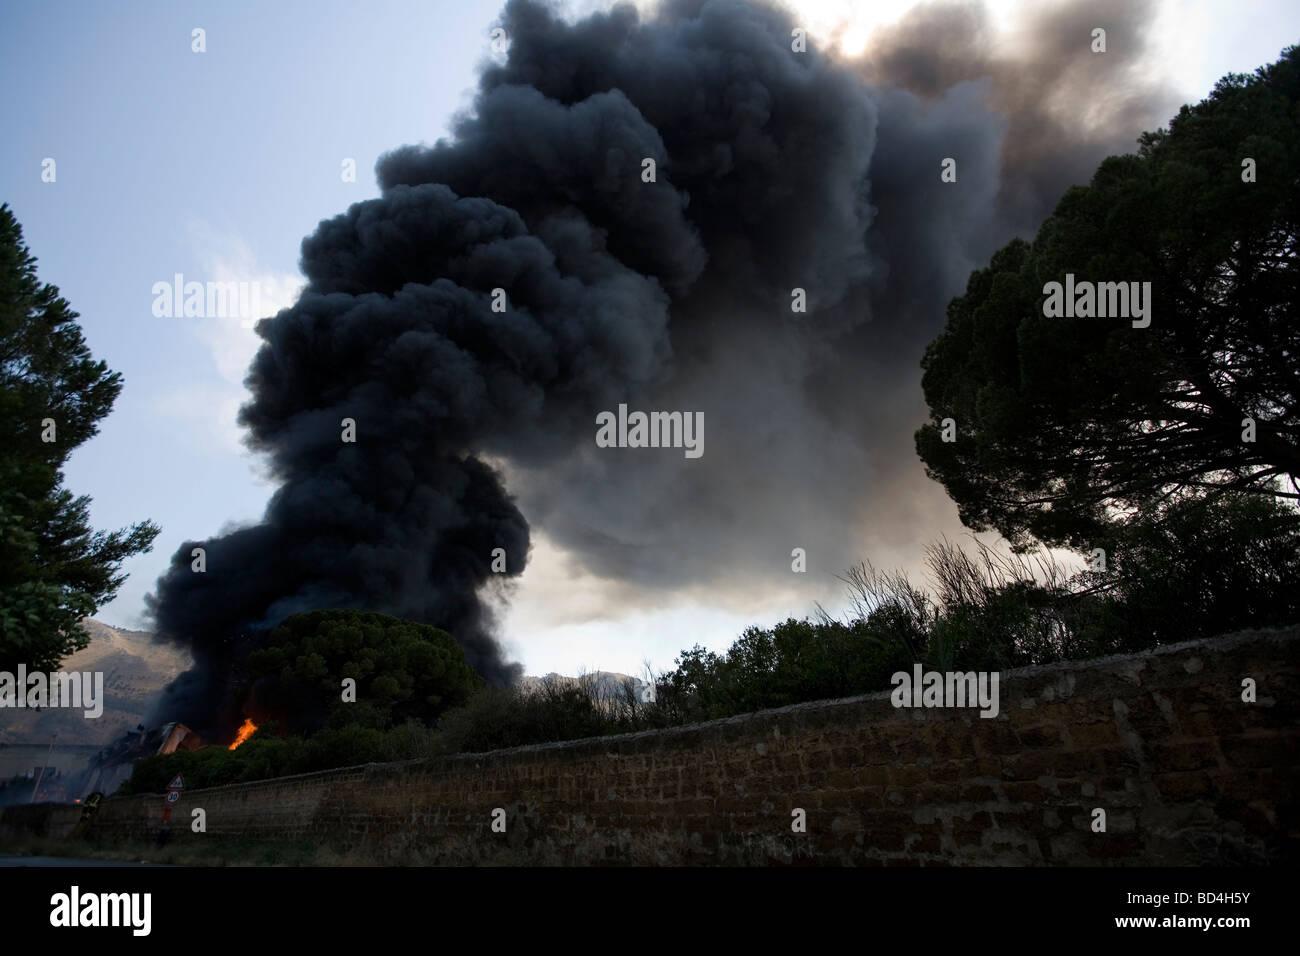 Plume of black smoke - Stock Image